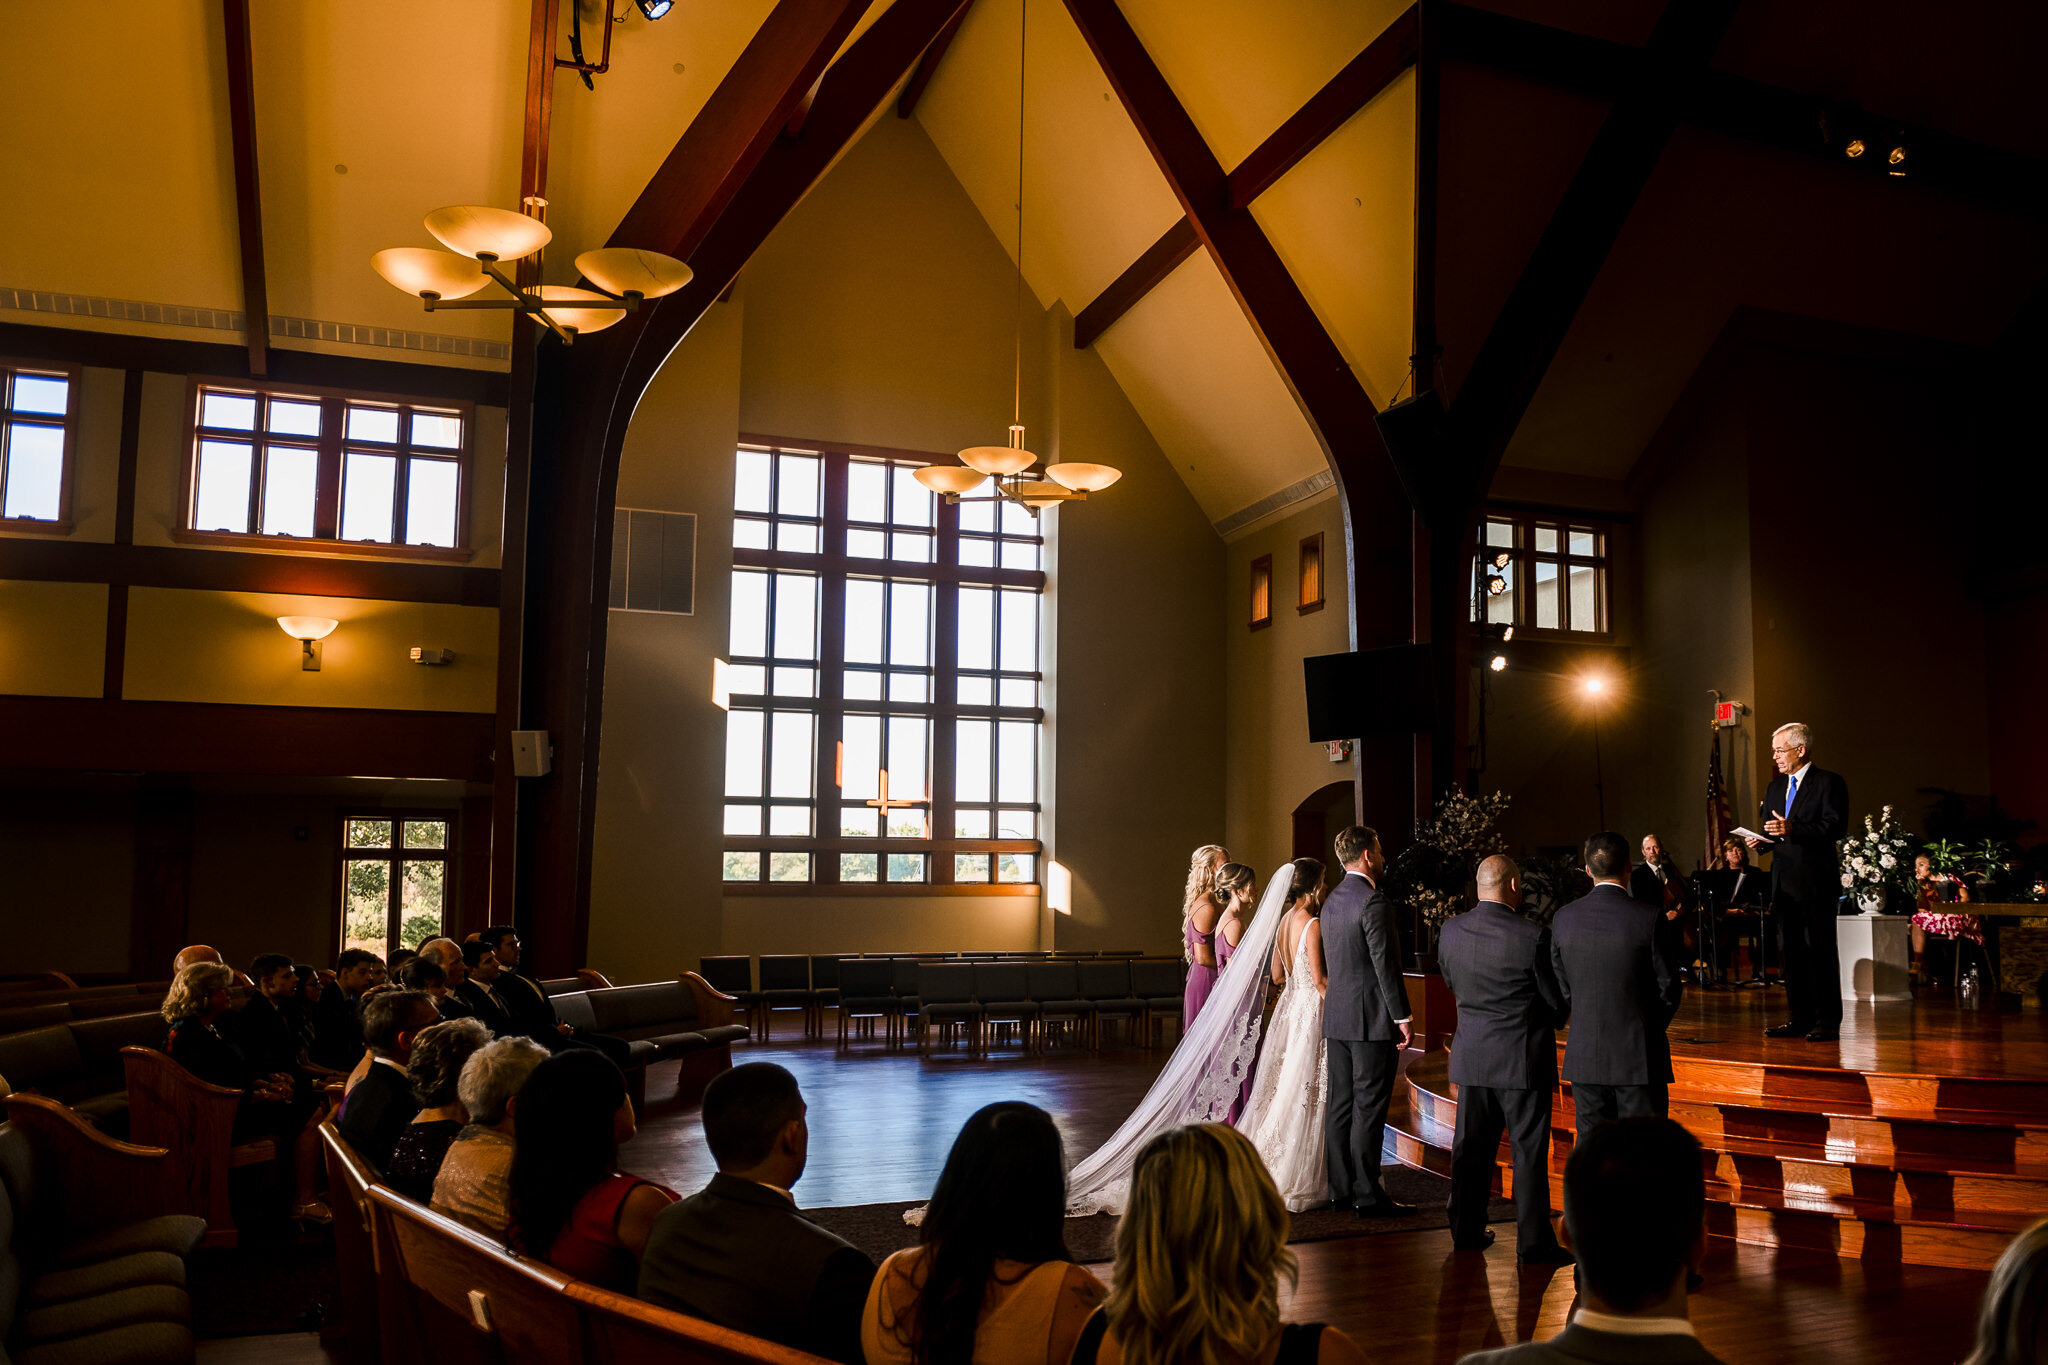 Coyle-Forsgate-Country-Club-Wedding-Photographer-12.JPG